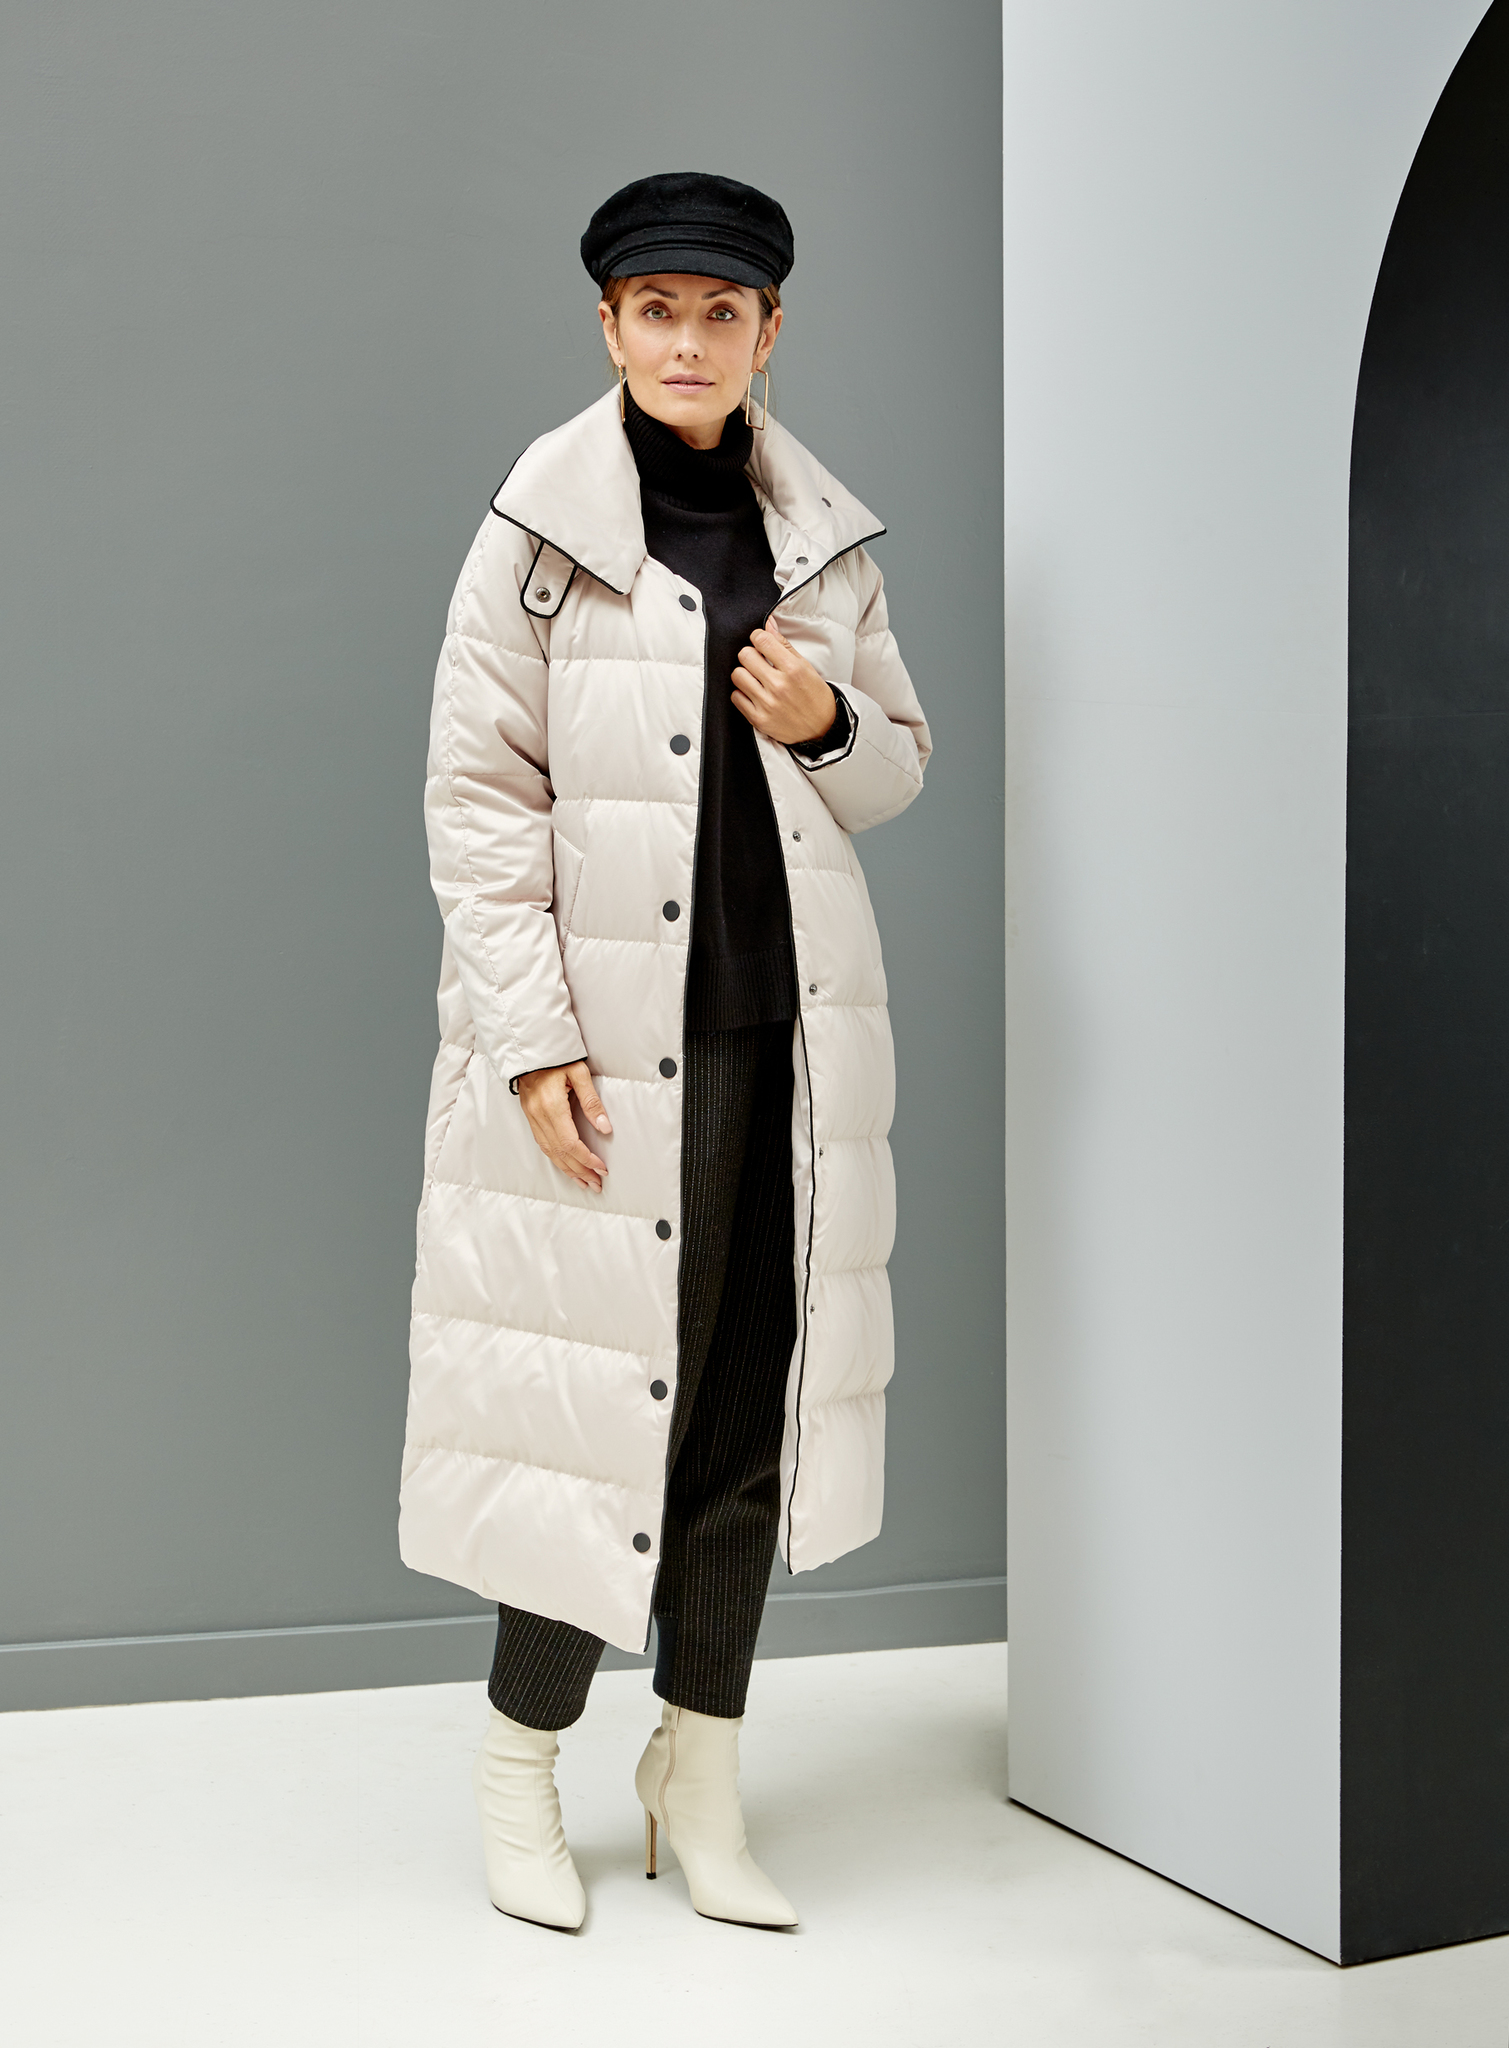 Верхняя одежда Пальто без капюшона 18-992 hassfashion-20-220277.jpg